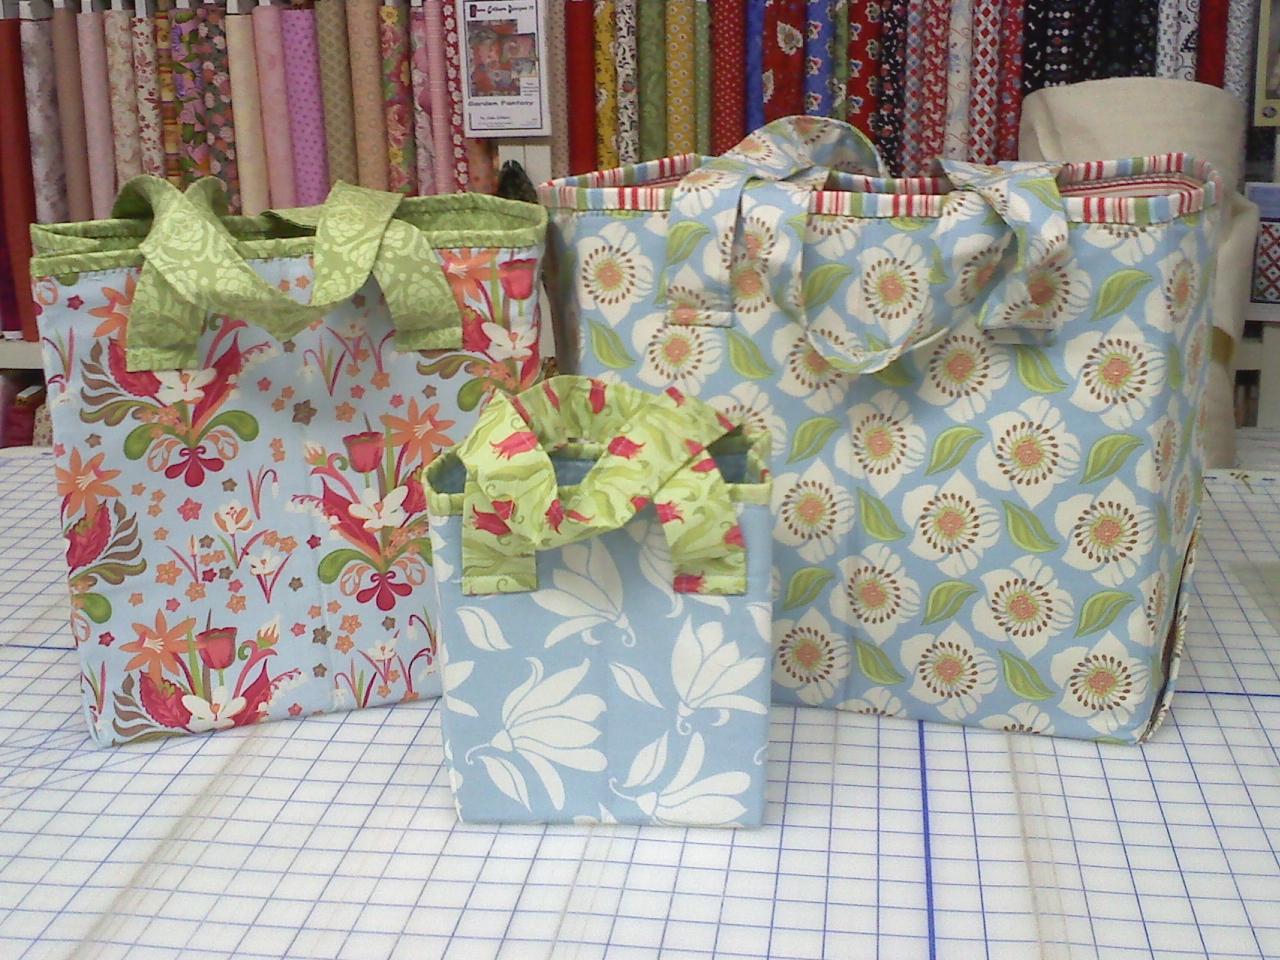 Atkinson Designs Stand N Stow : Creative sewing machines brag board groovy girls club